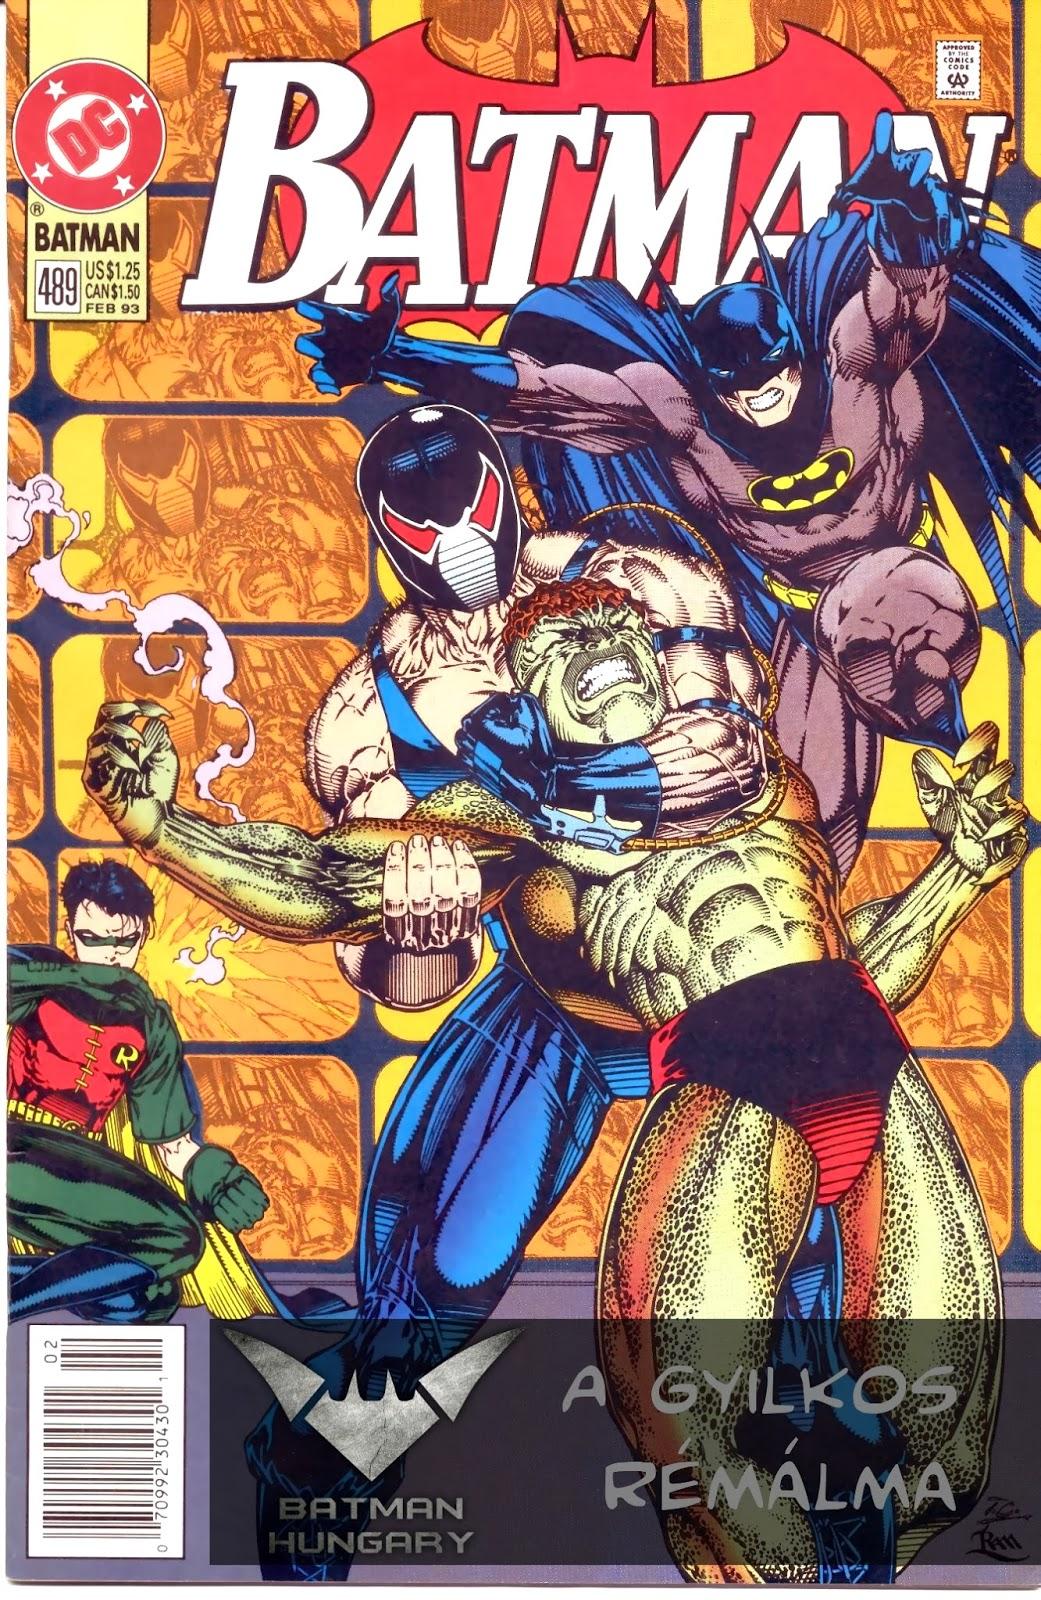 https://www.dropbox.com/s/wh794sqmndzd3mt/Batman-489-Batman-Hungary.cbr